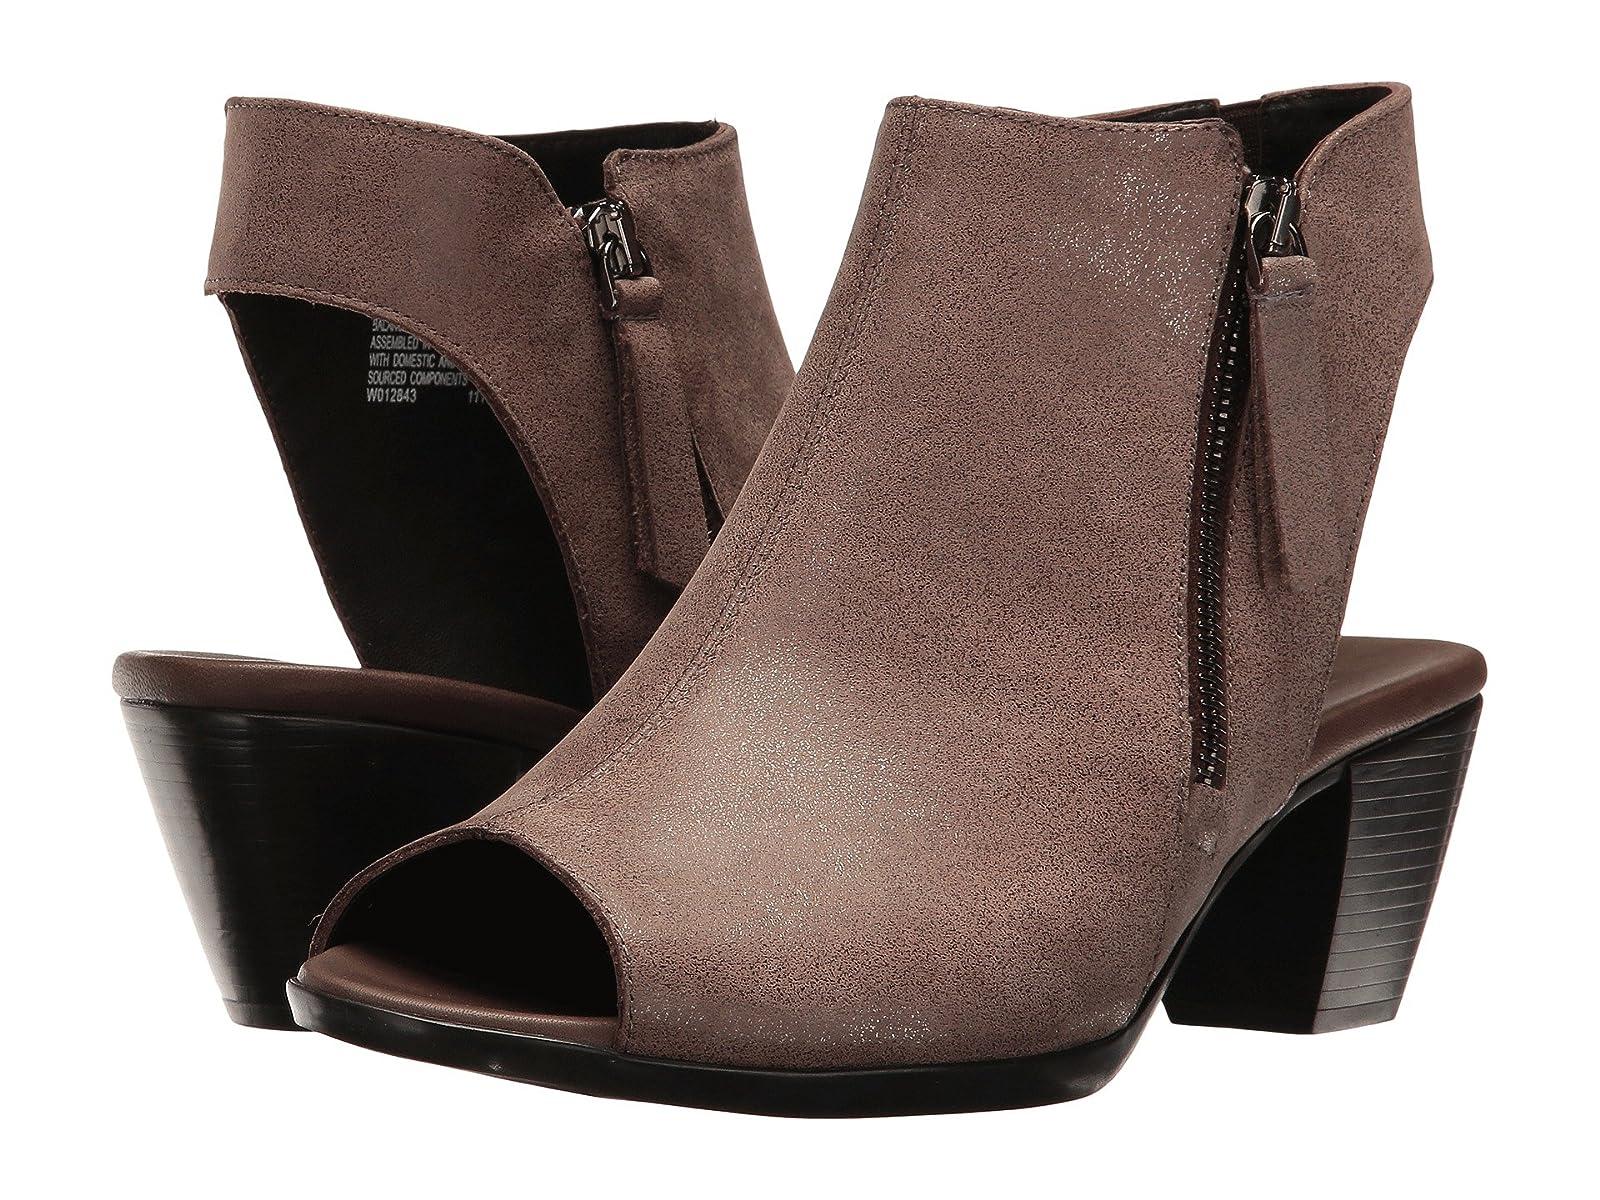 Munro NakitaCheap and distinctive eye-catching shoes